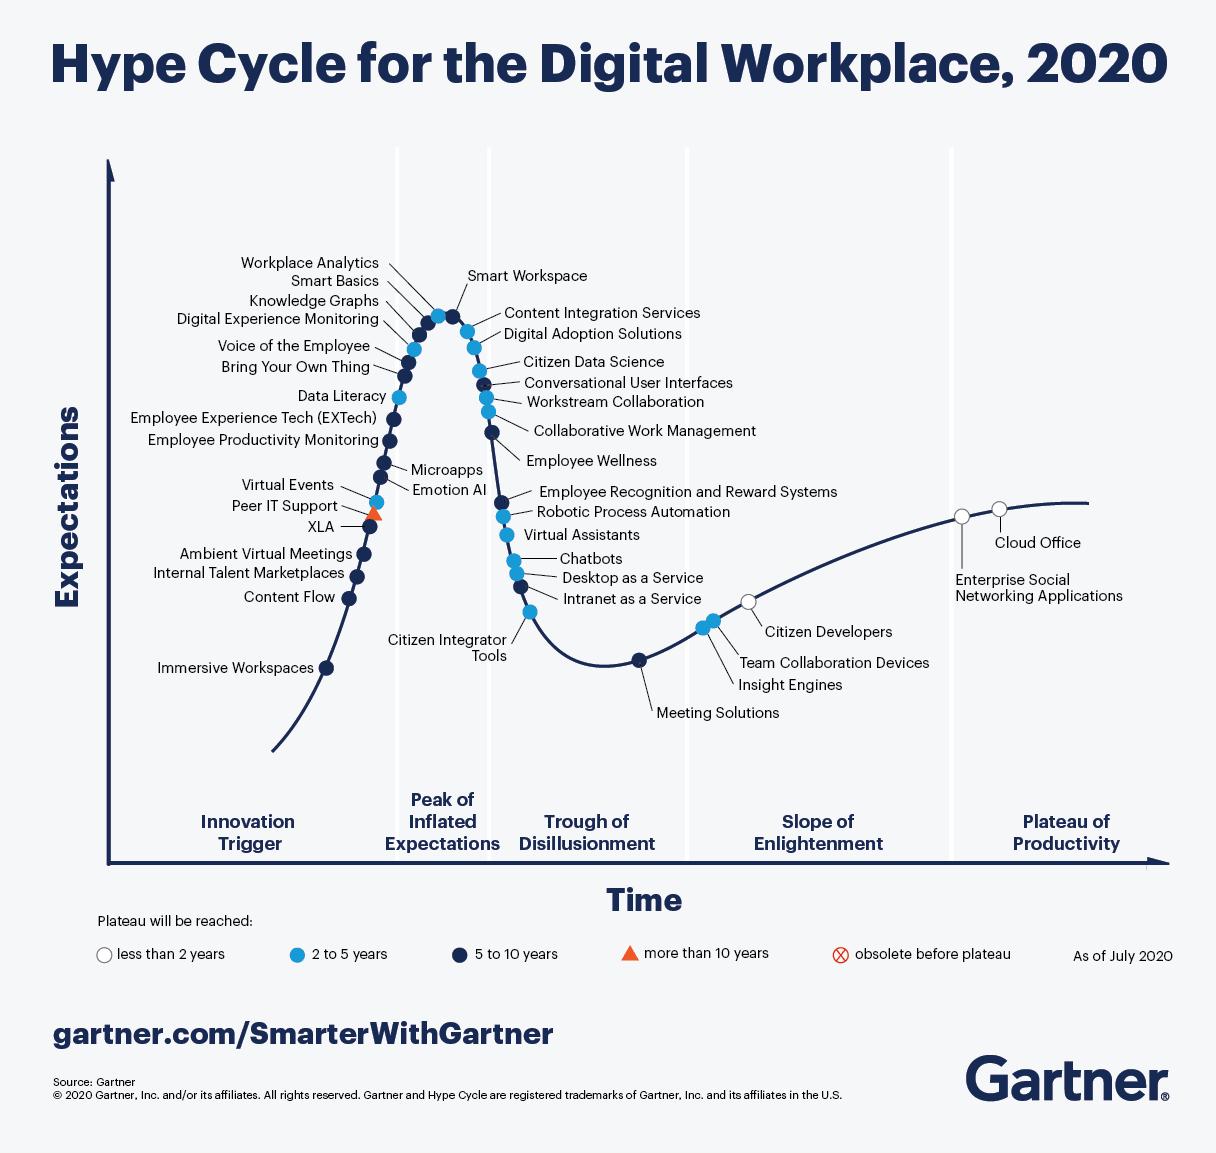 DaaS Hype Cycle